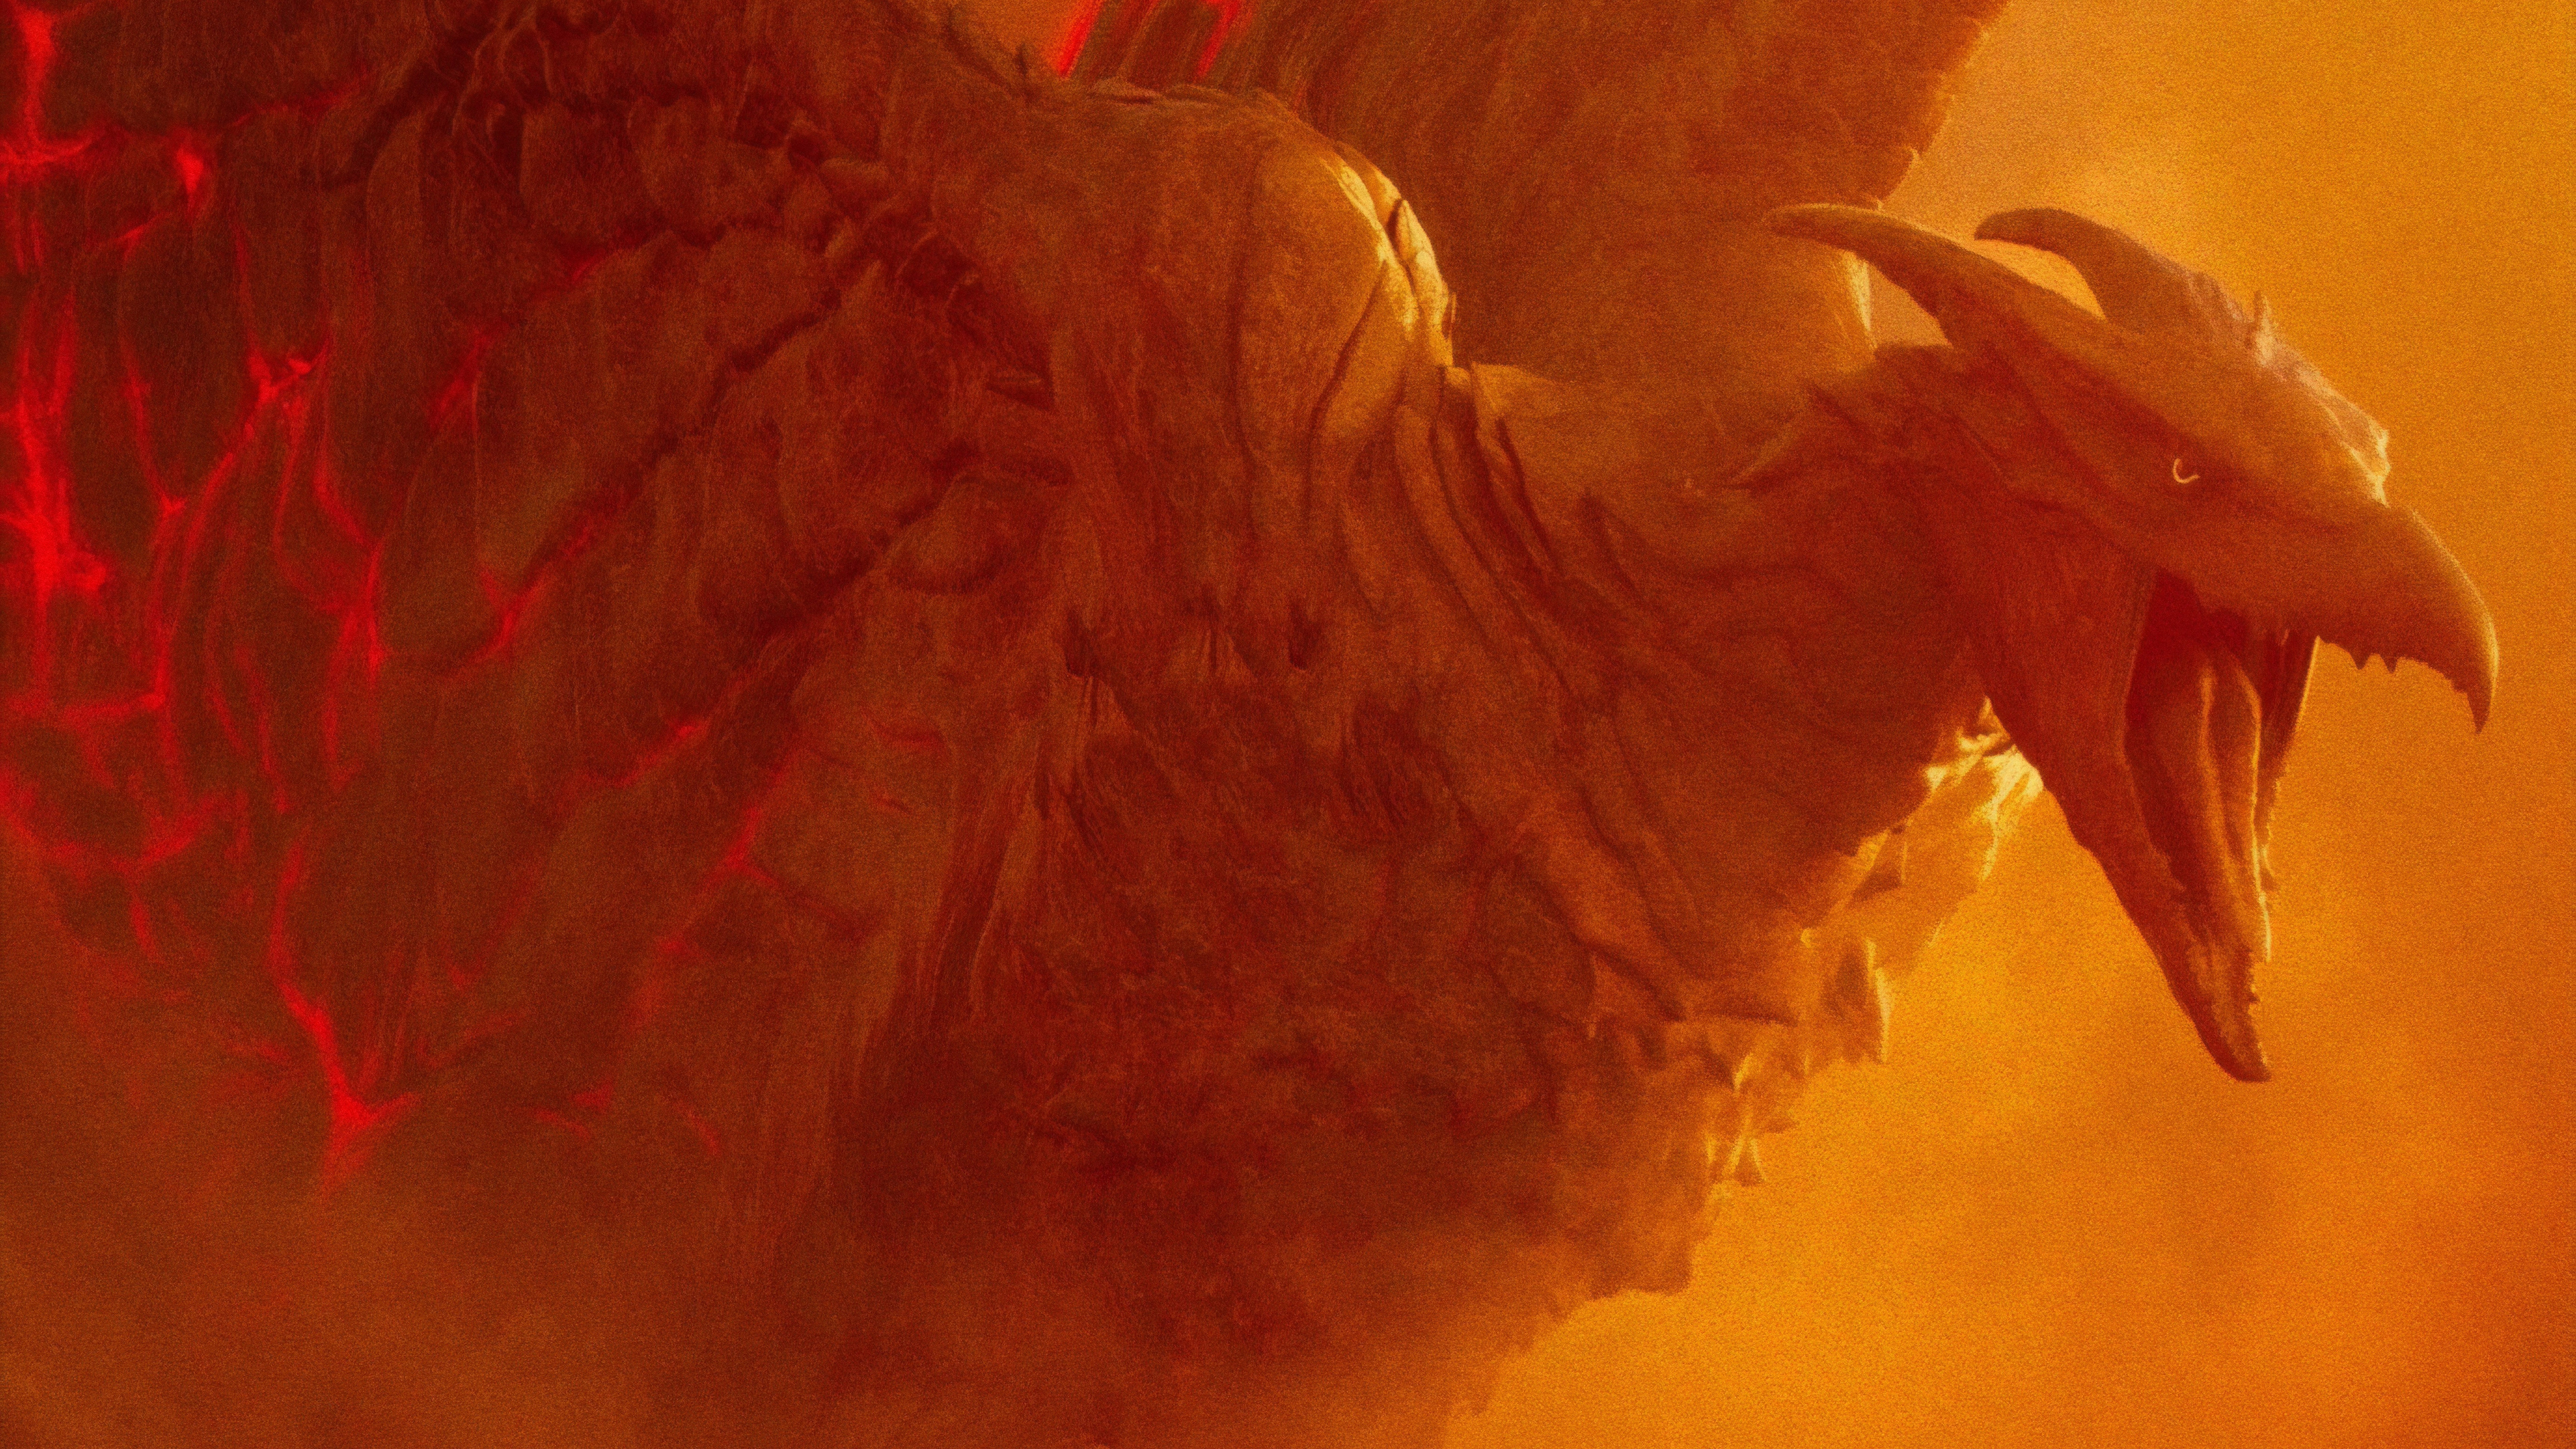 Wallpaper 4k Rodan Godzilla King Of The Monsters 4k 2019 Movies